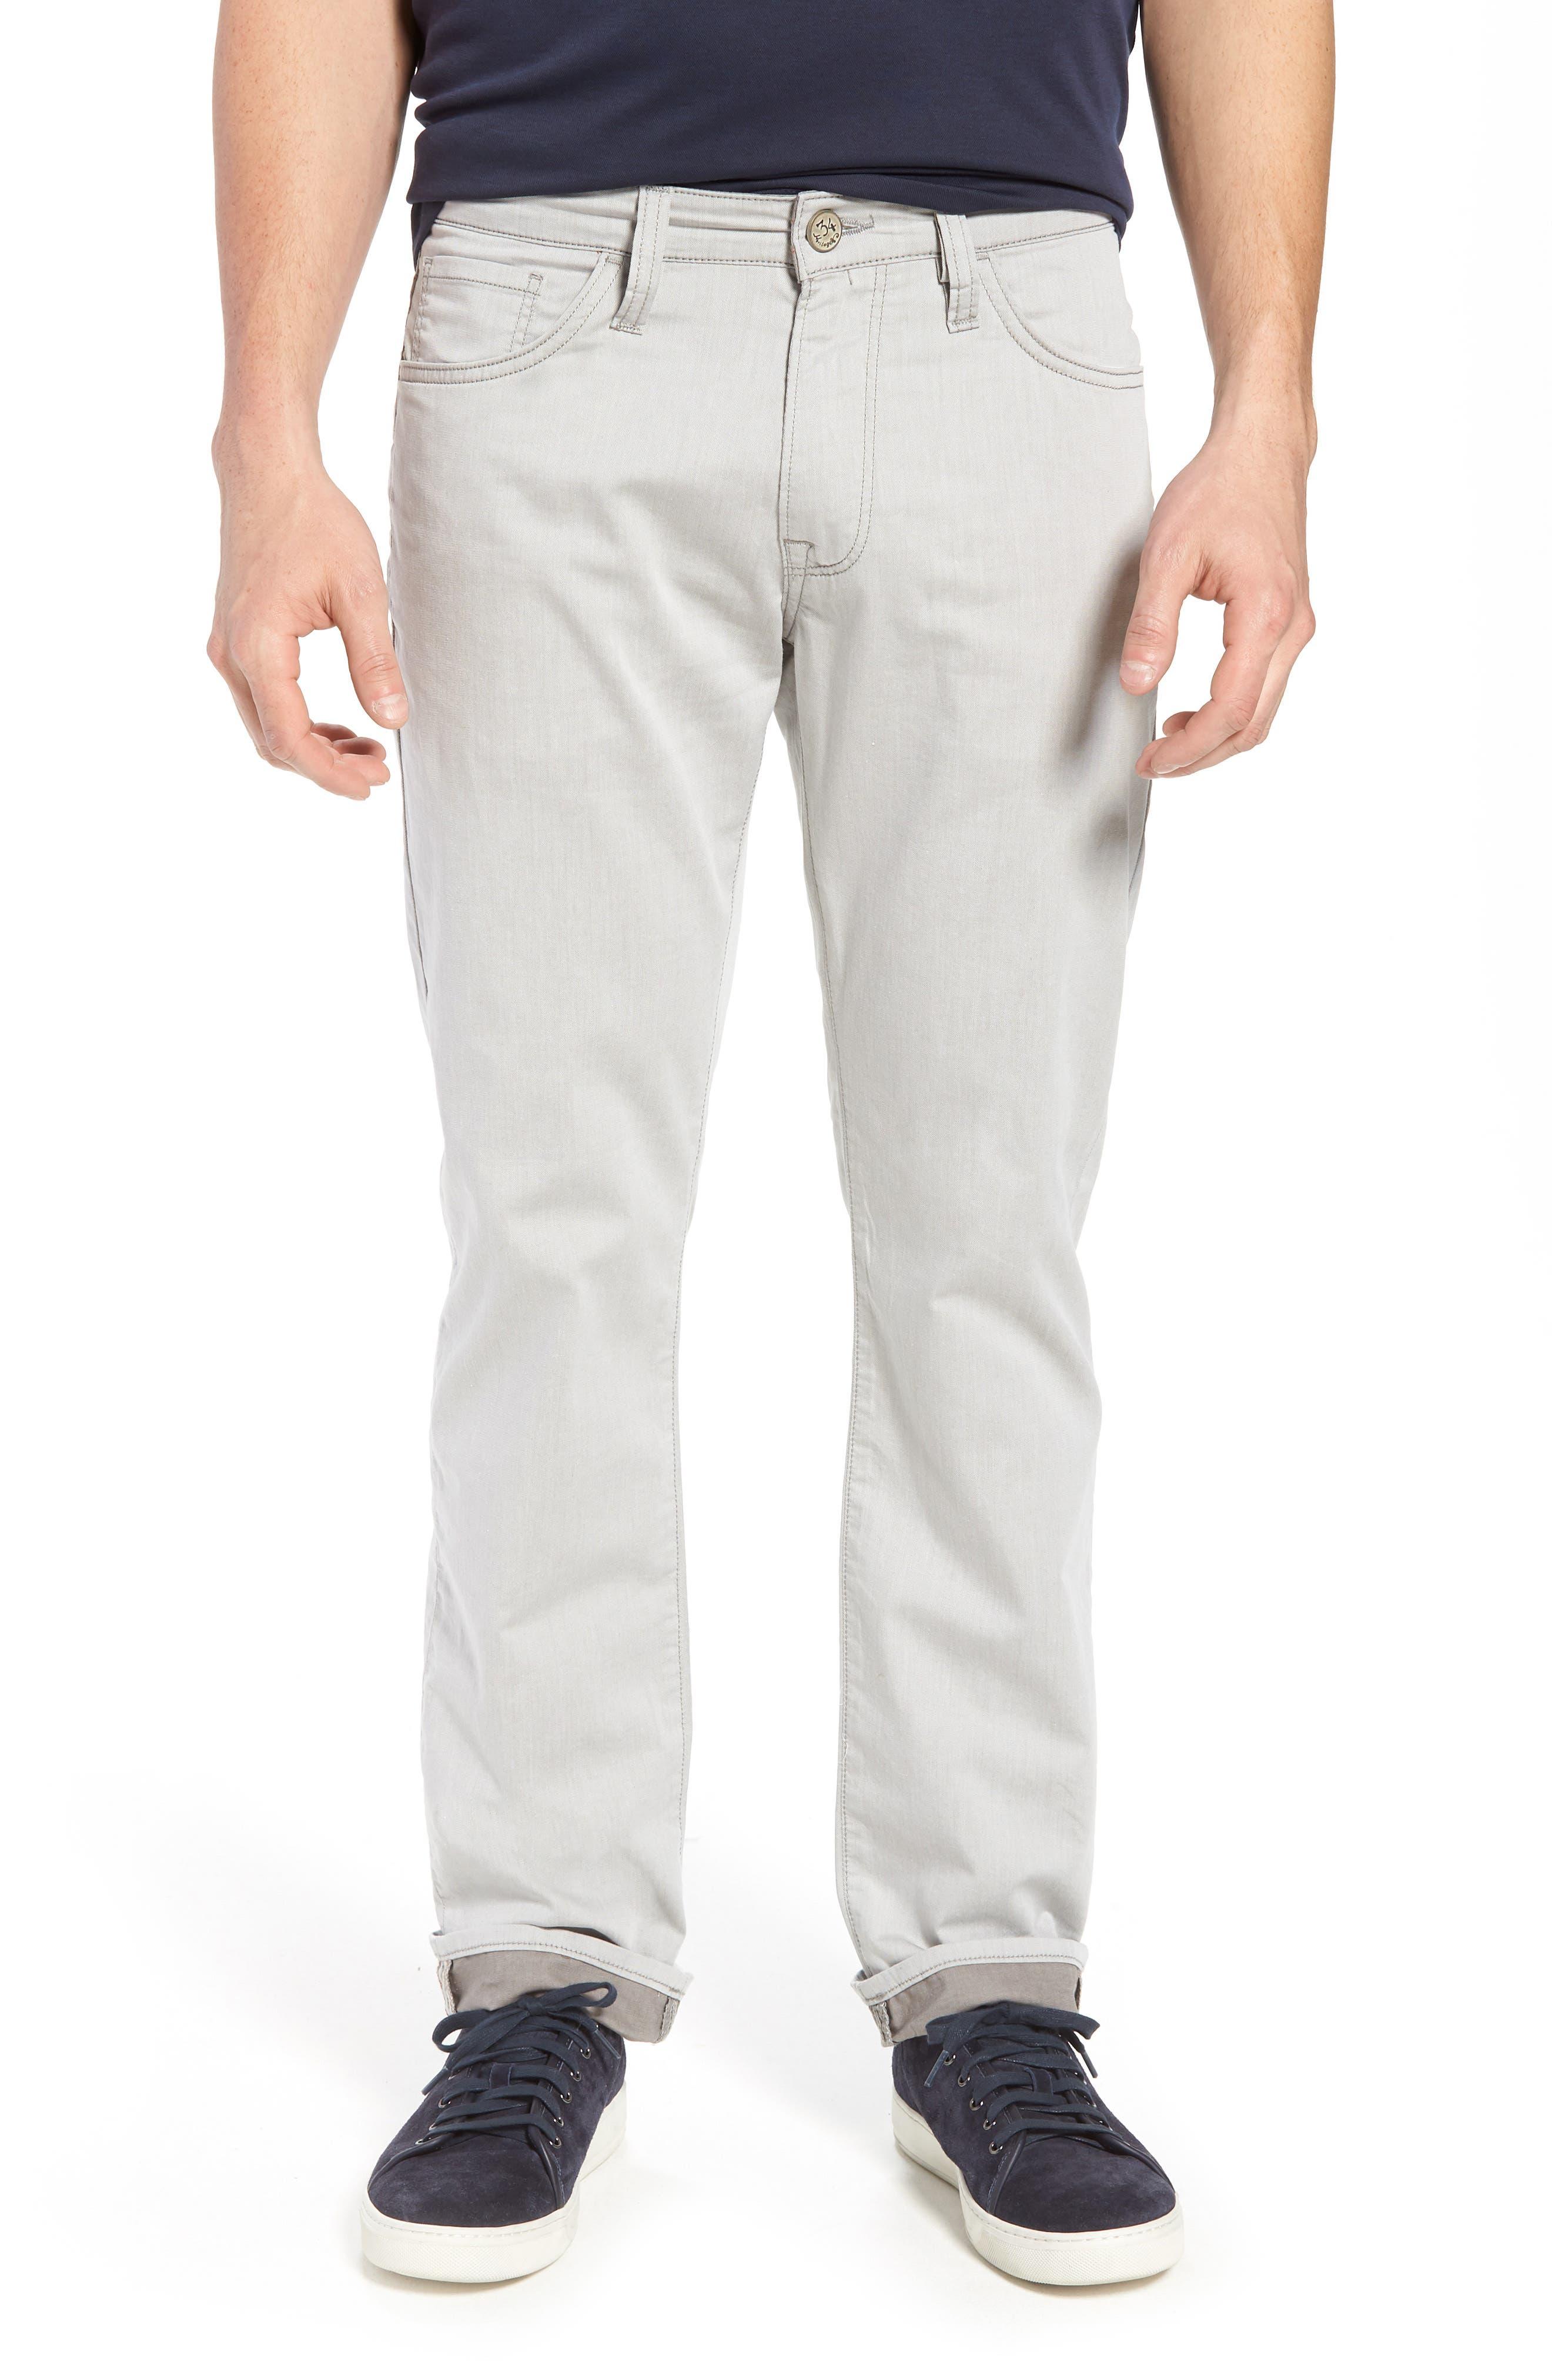 Courage Straight Leg Jeans,                         Main,                         color, Latte Herringbone Reversed